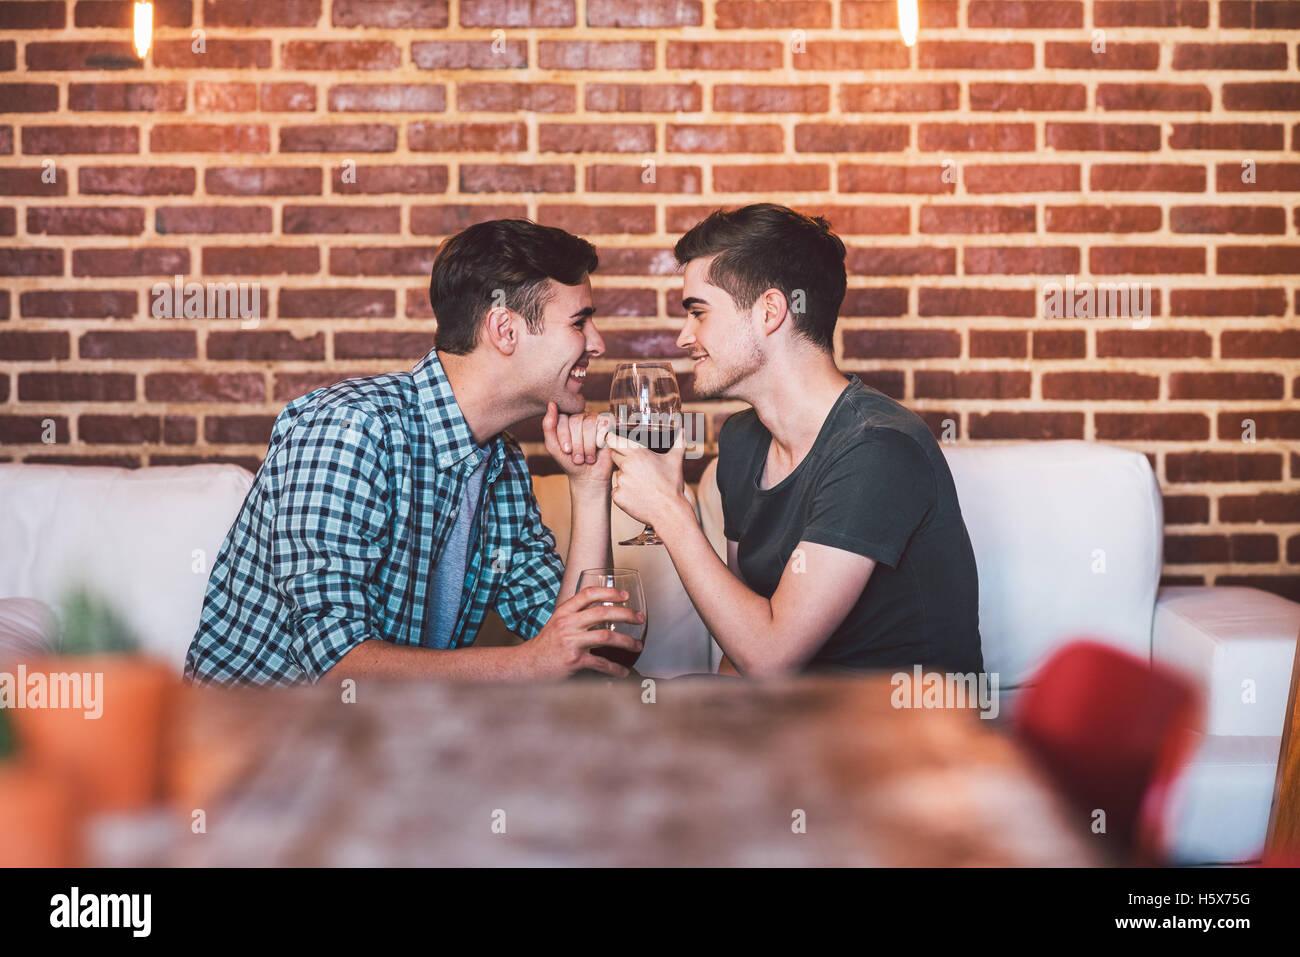 Compartir vino y romance Imagen De Stock